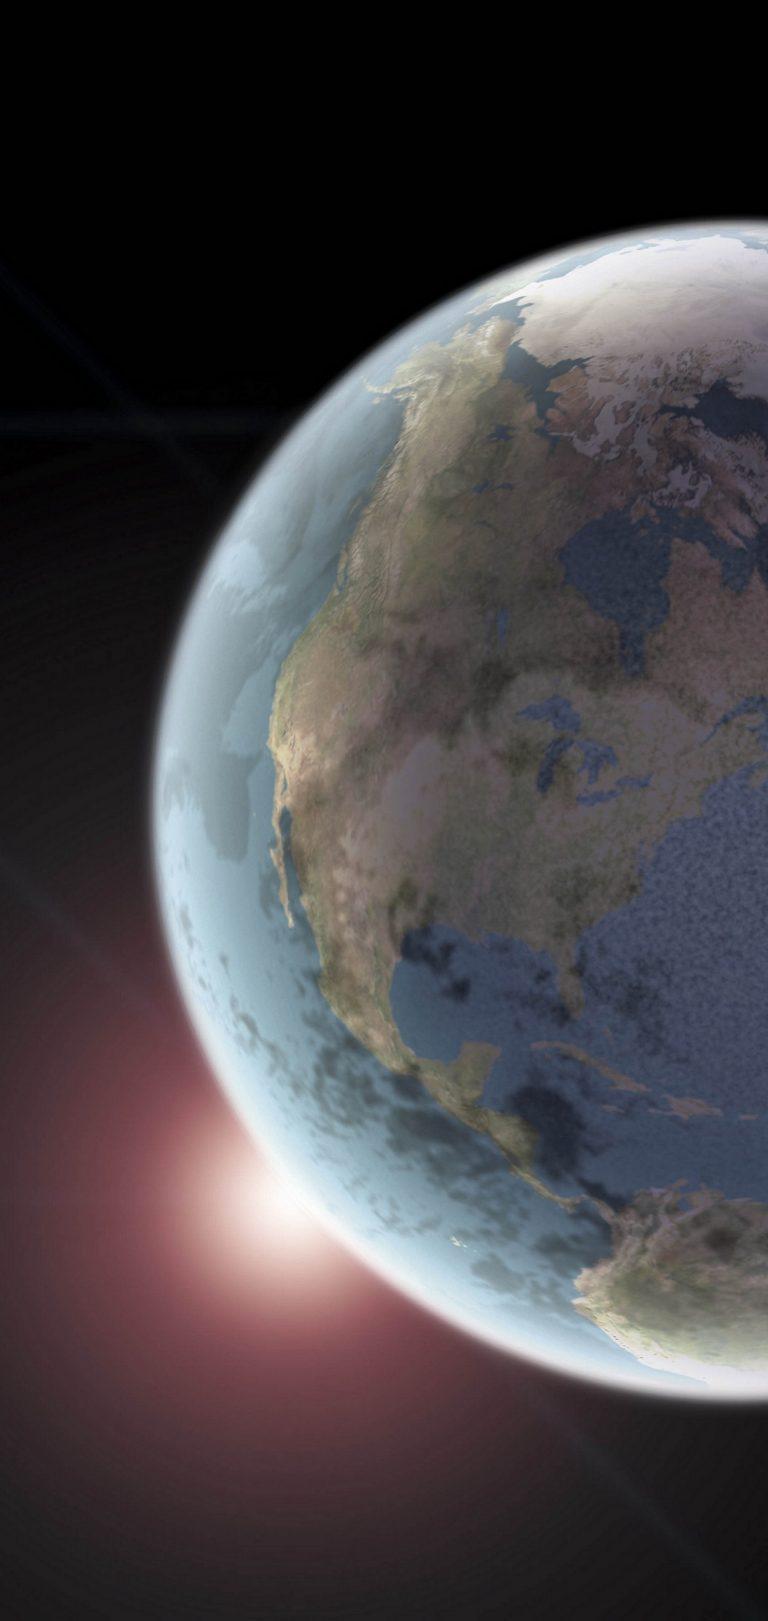 Earth Space Light Wallpaper 1440x3040 768x1621